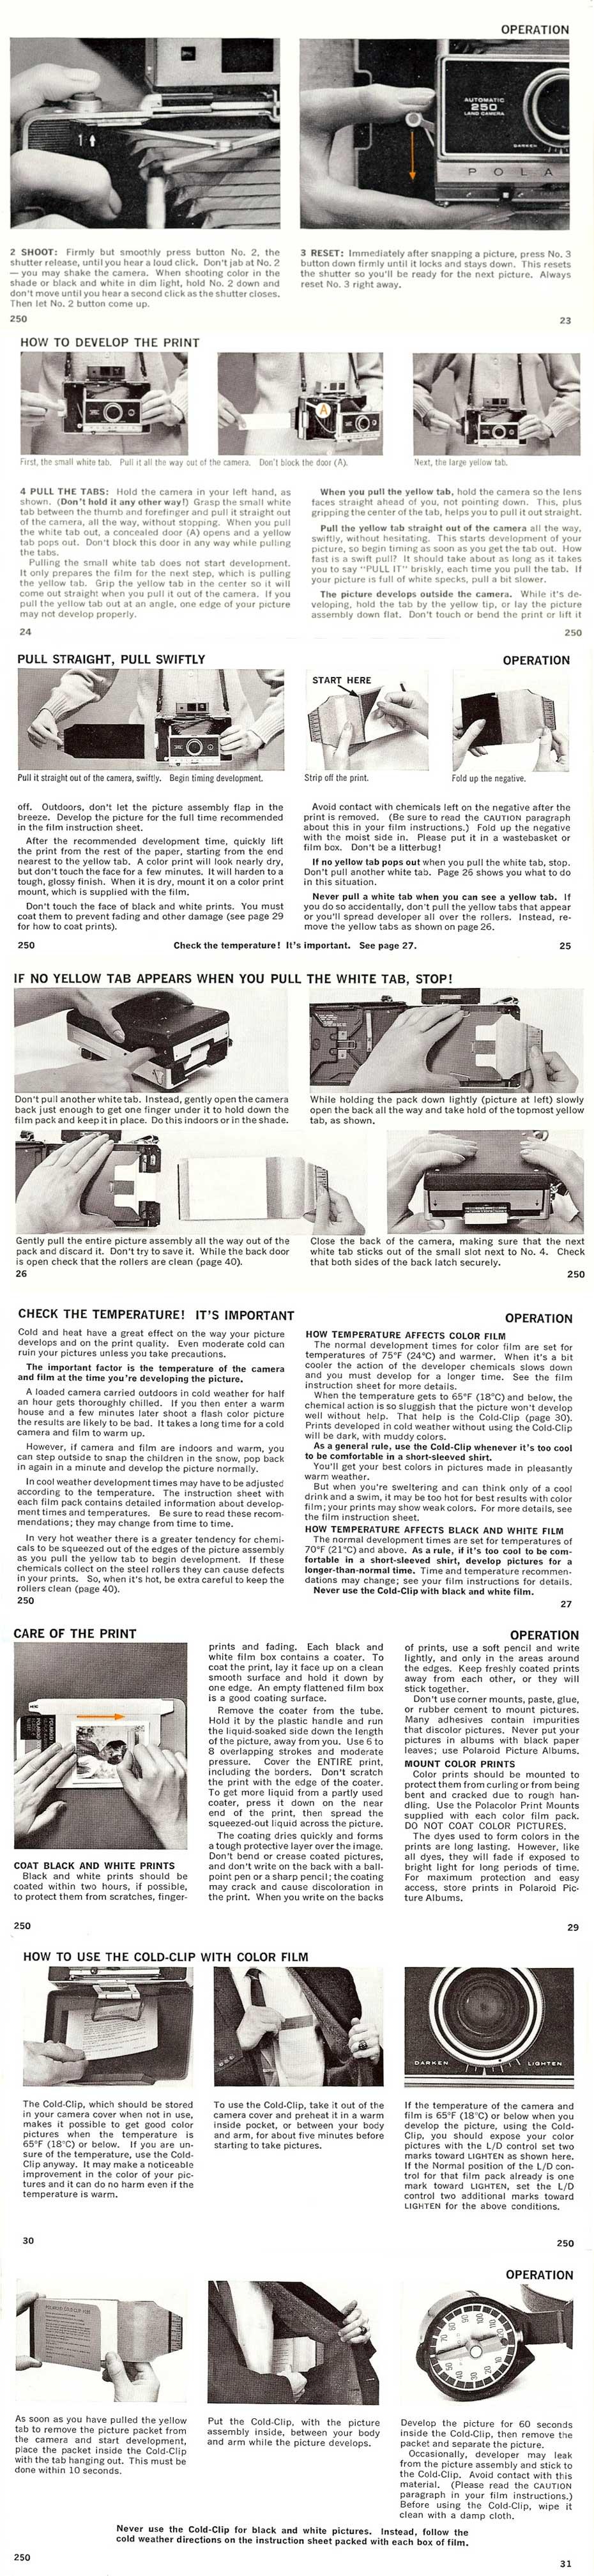 Model 250 instructions